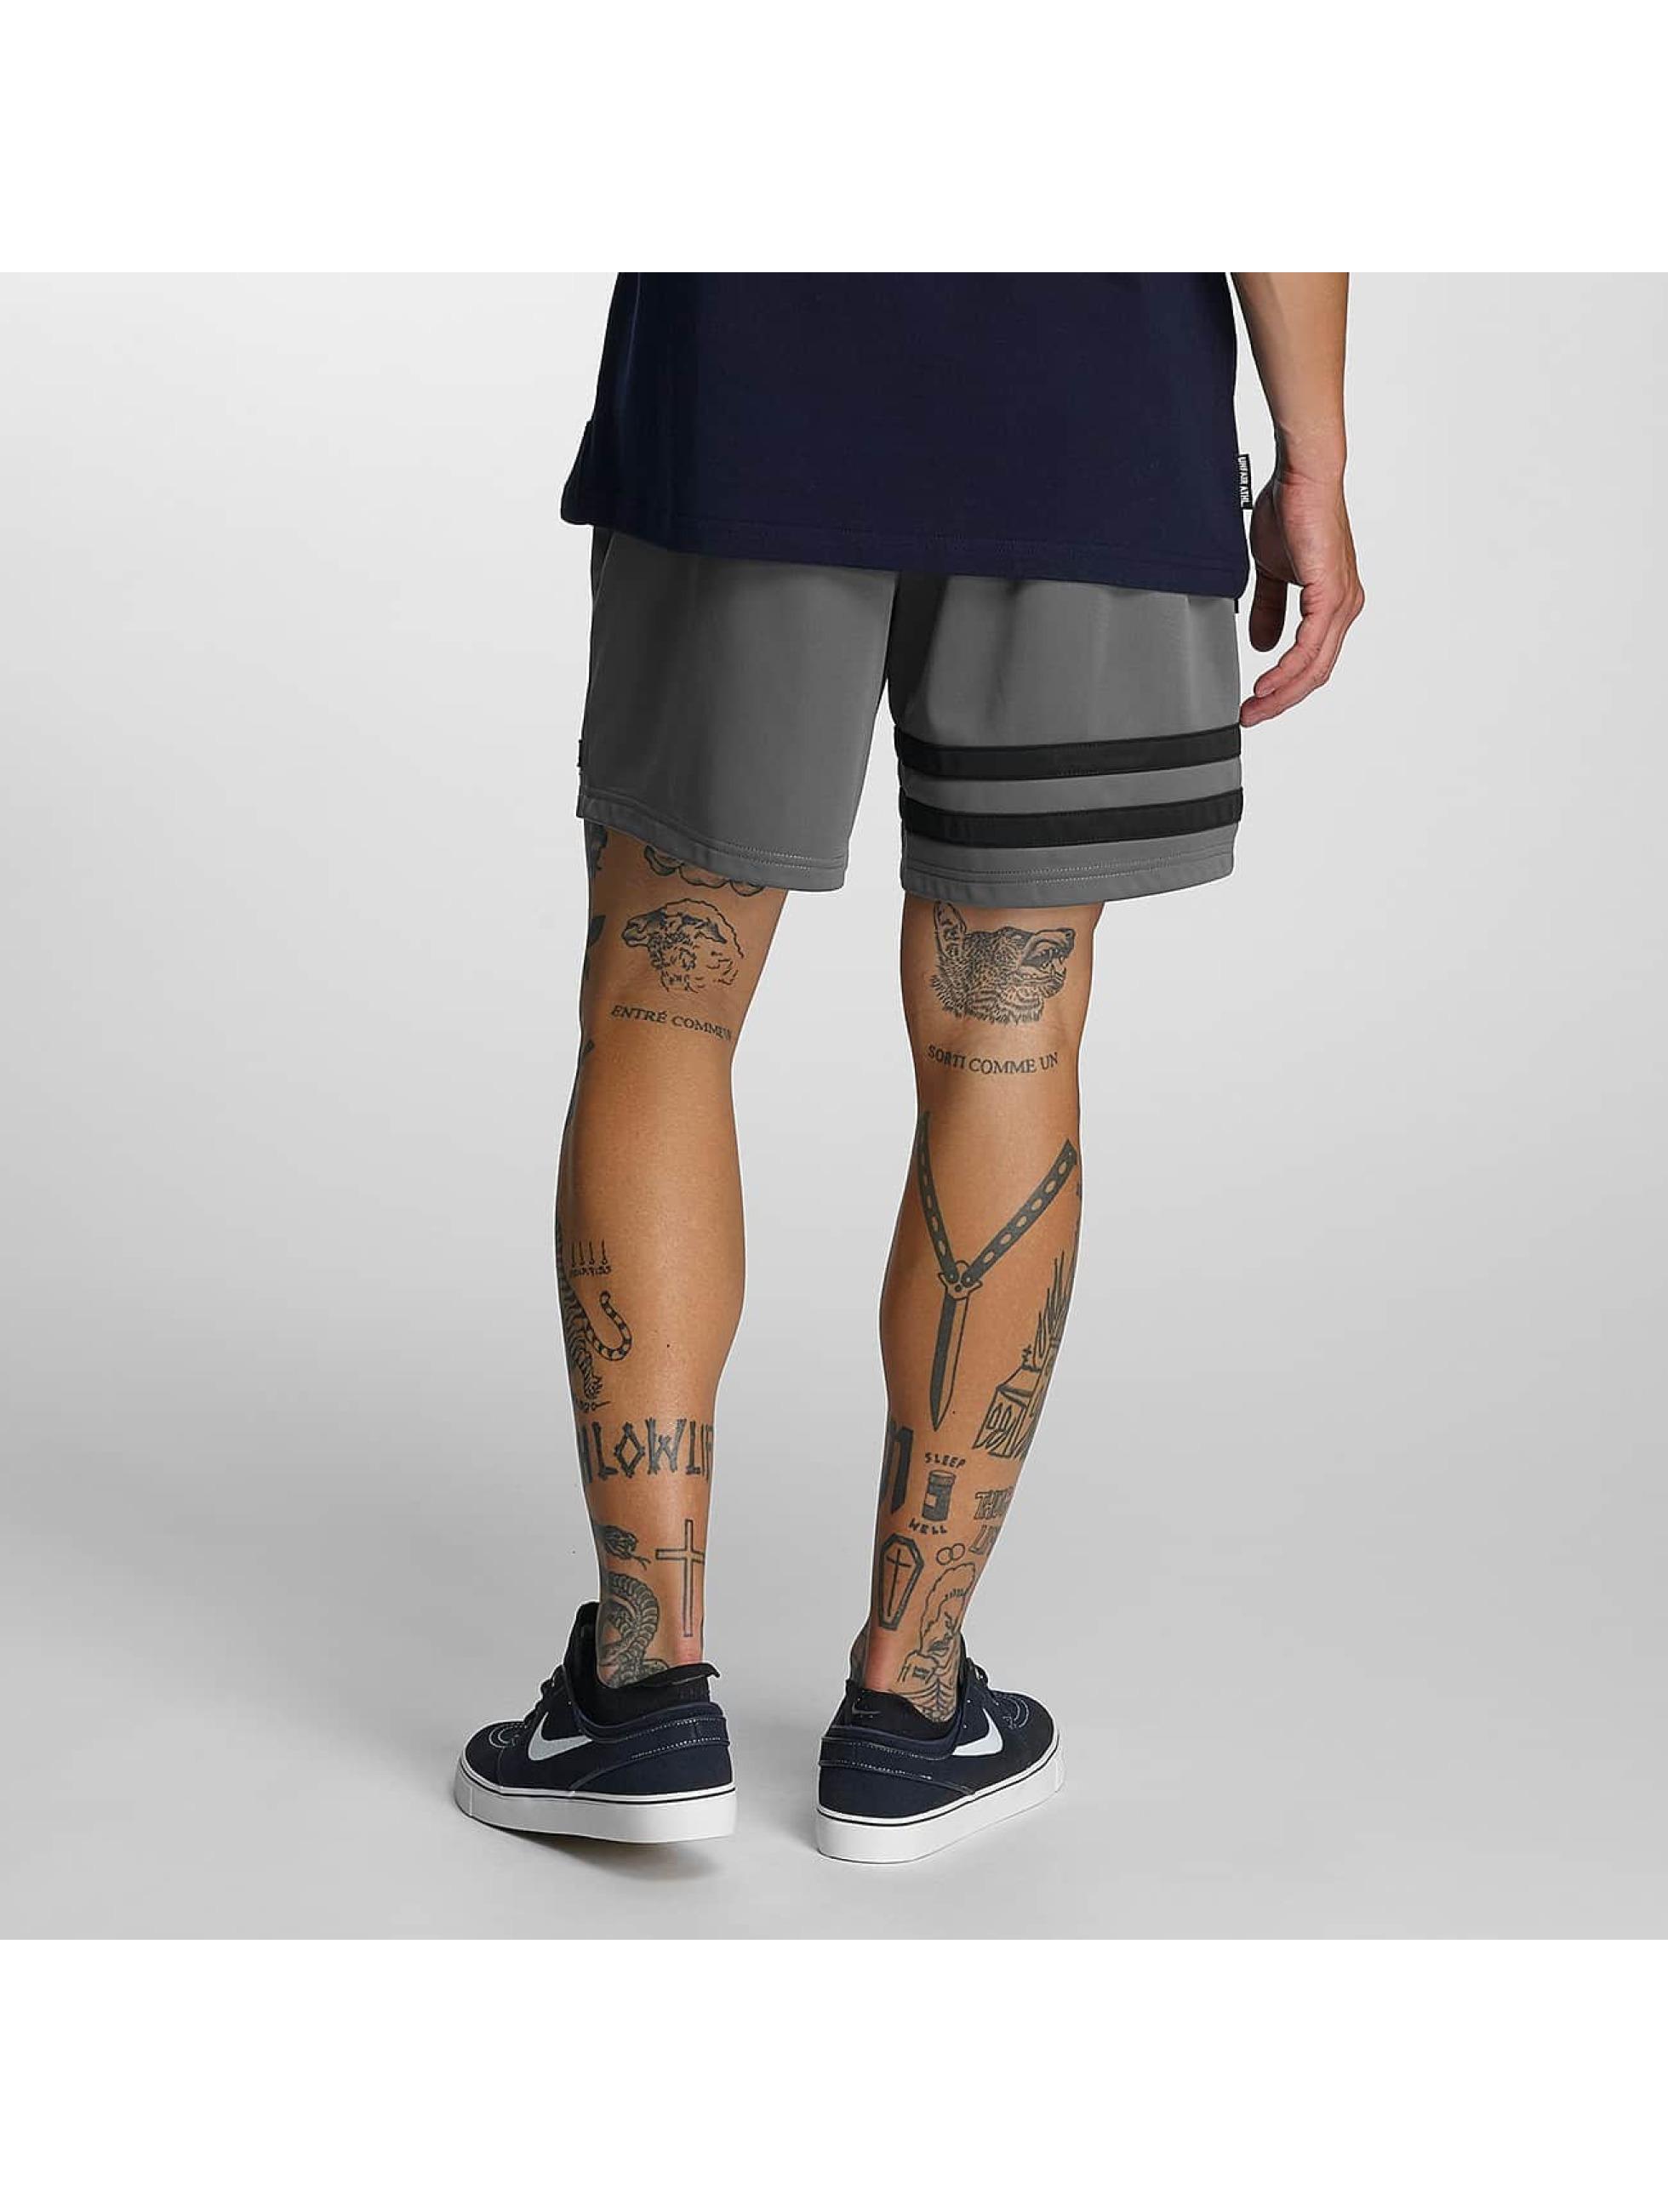 UNFAIR ATHLETICS Short DMWU gray